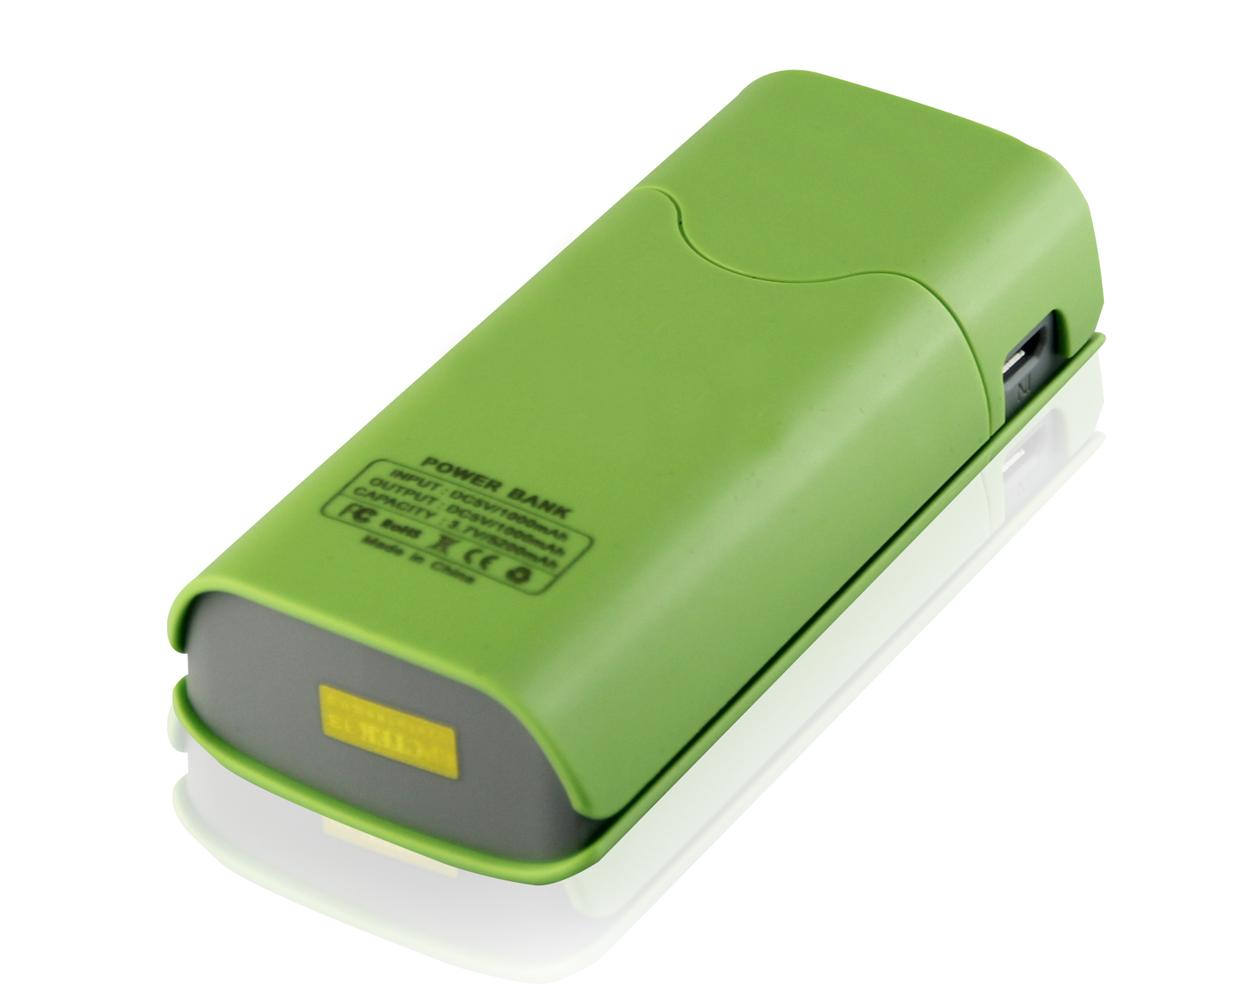 5200mah portable usb external power bank battery charger pack for mobile phone. Black Bedroom Furniture Sets. Home Design Ideas